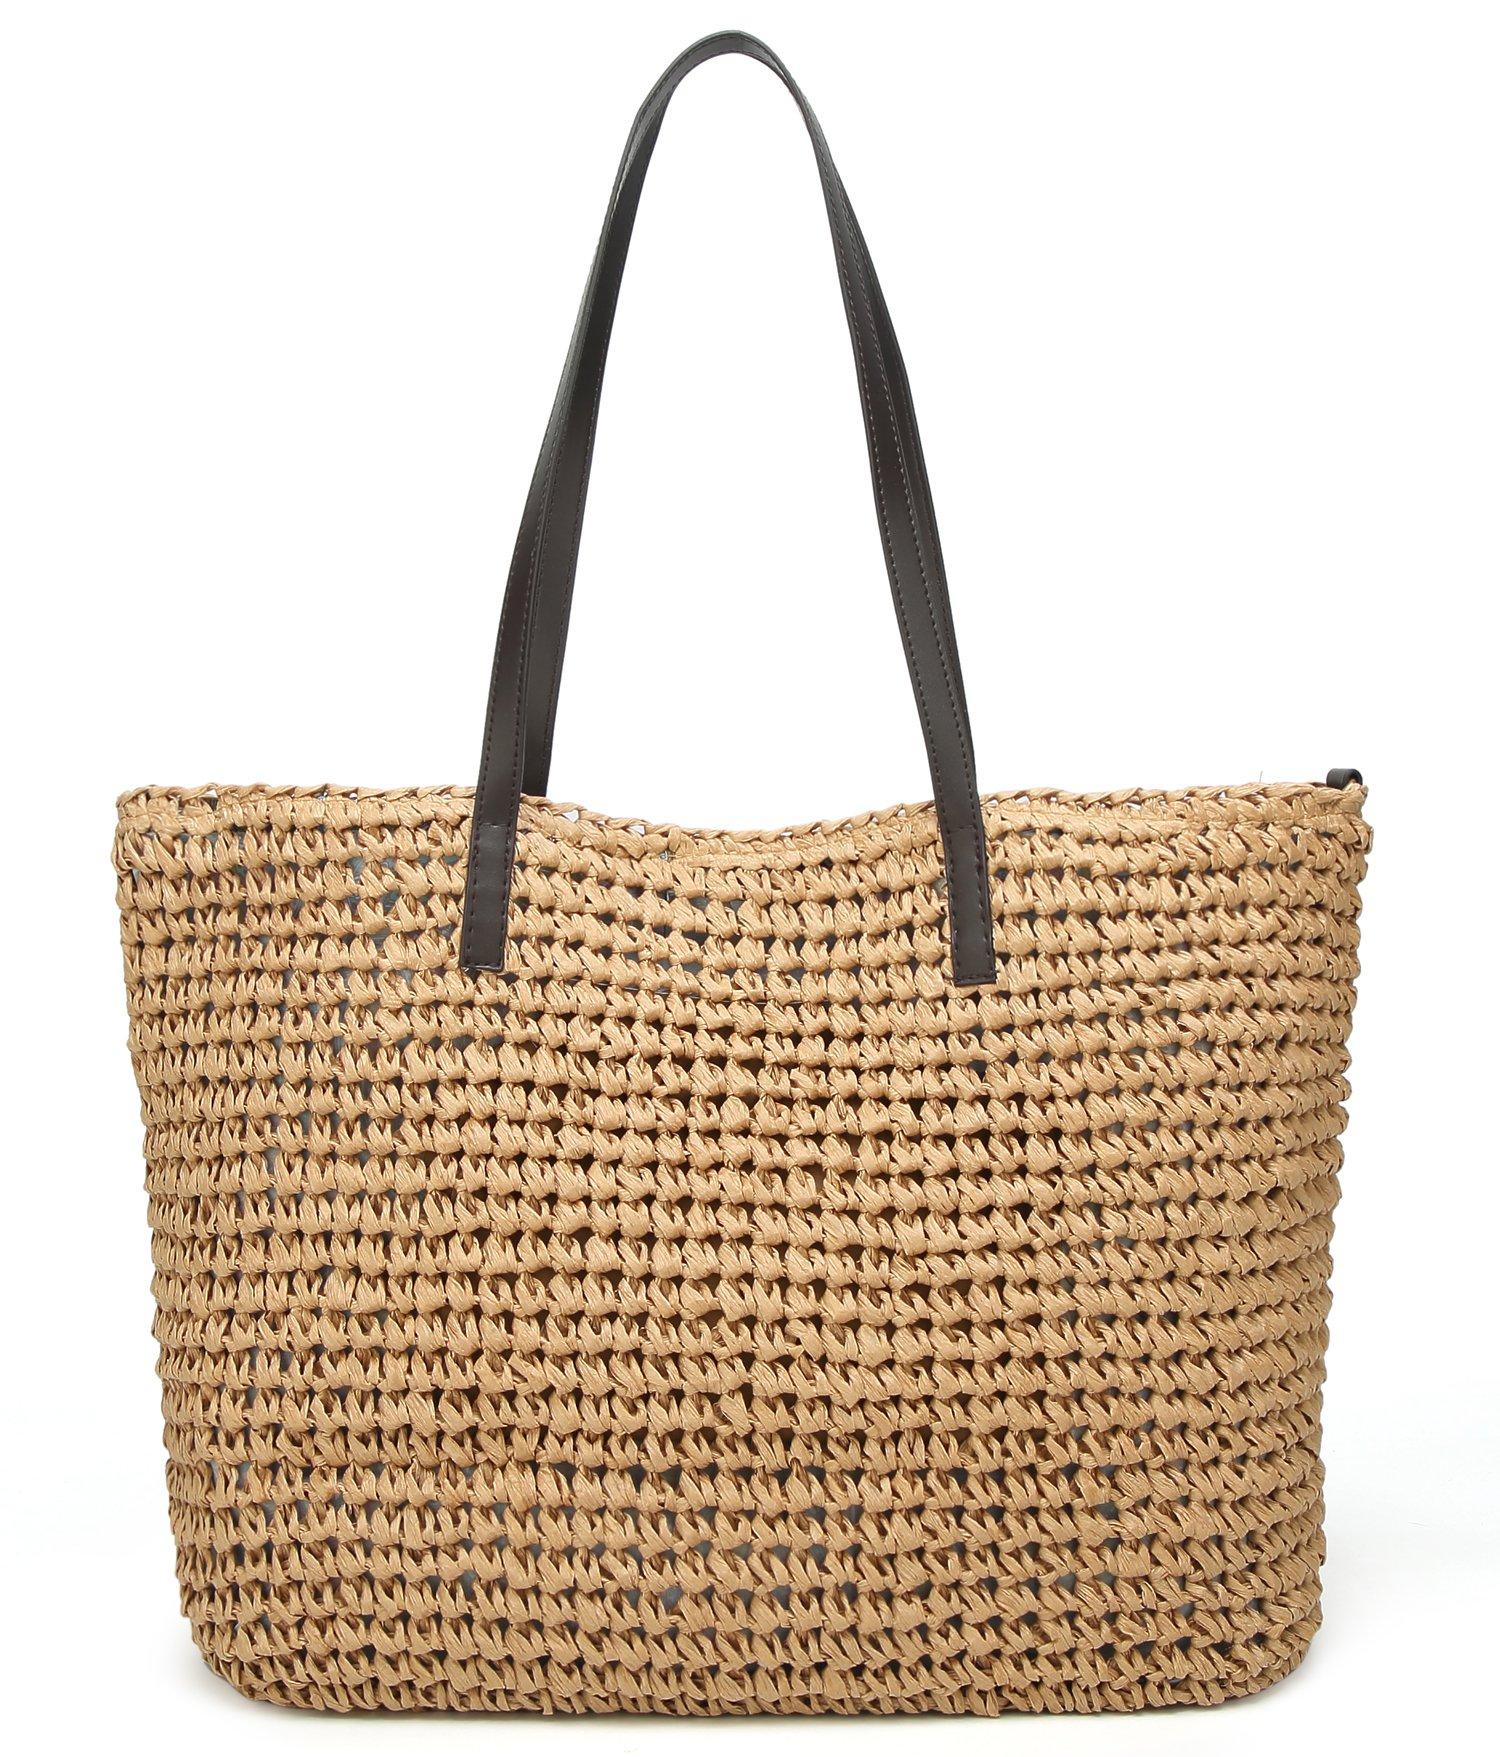 Obosoyo Women's Classic Straw Handbag Summer Beach Sea Shoulder Bag Large Tote Light-Coffee